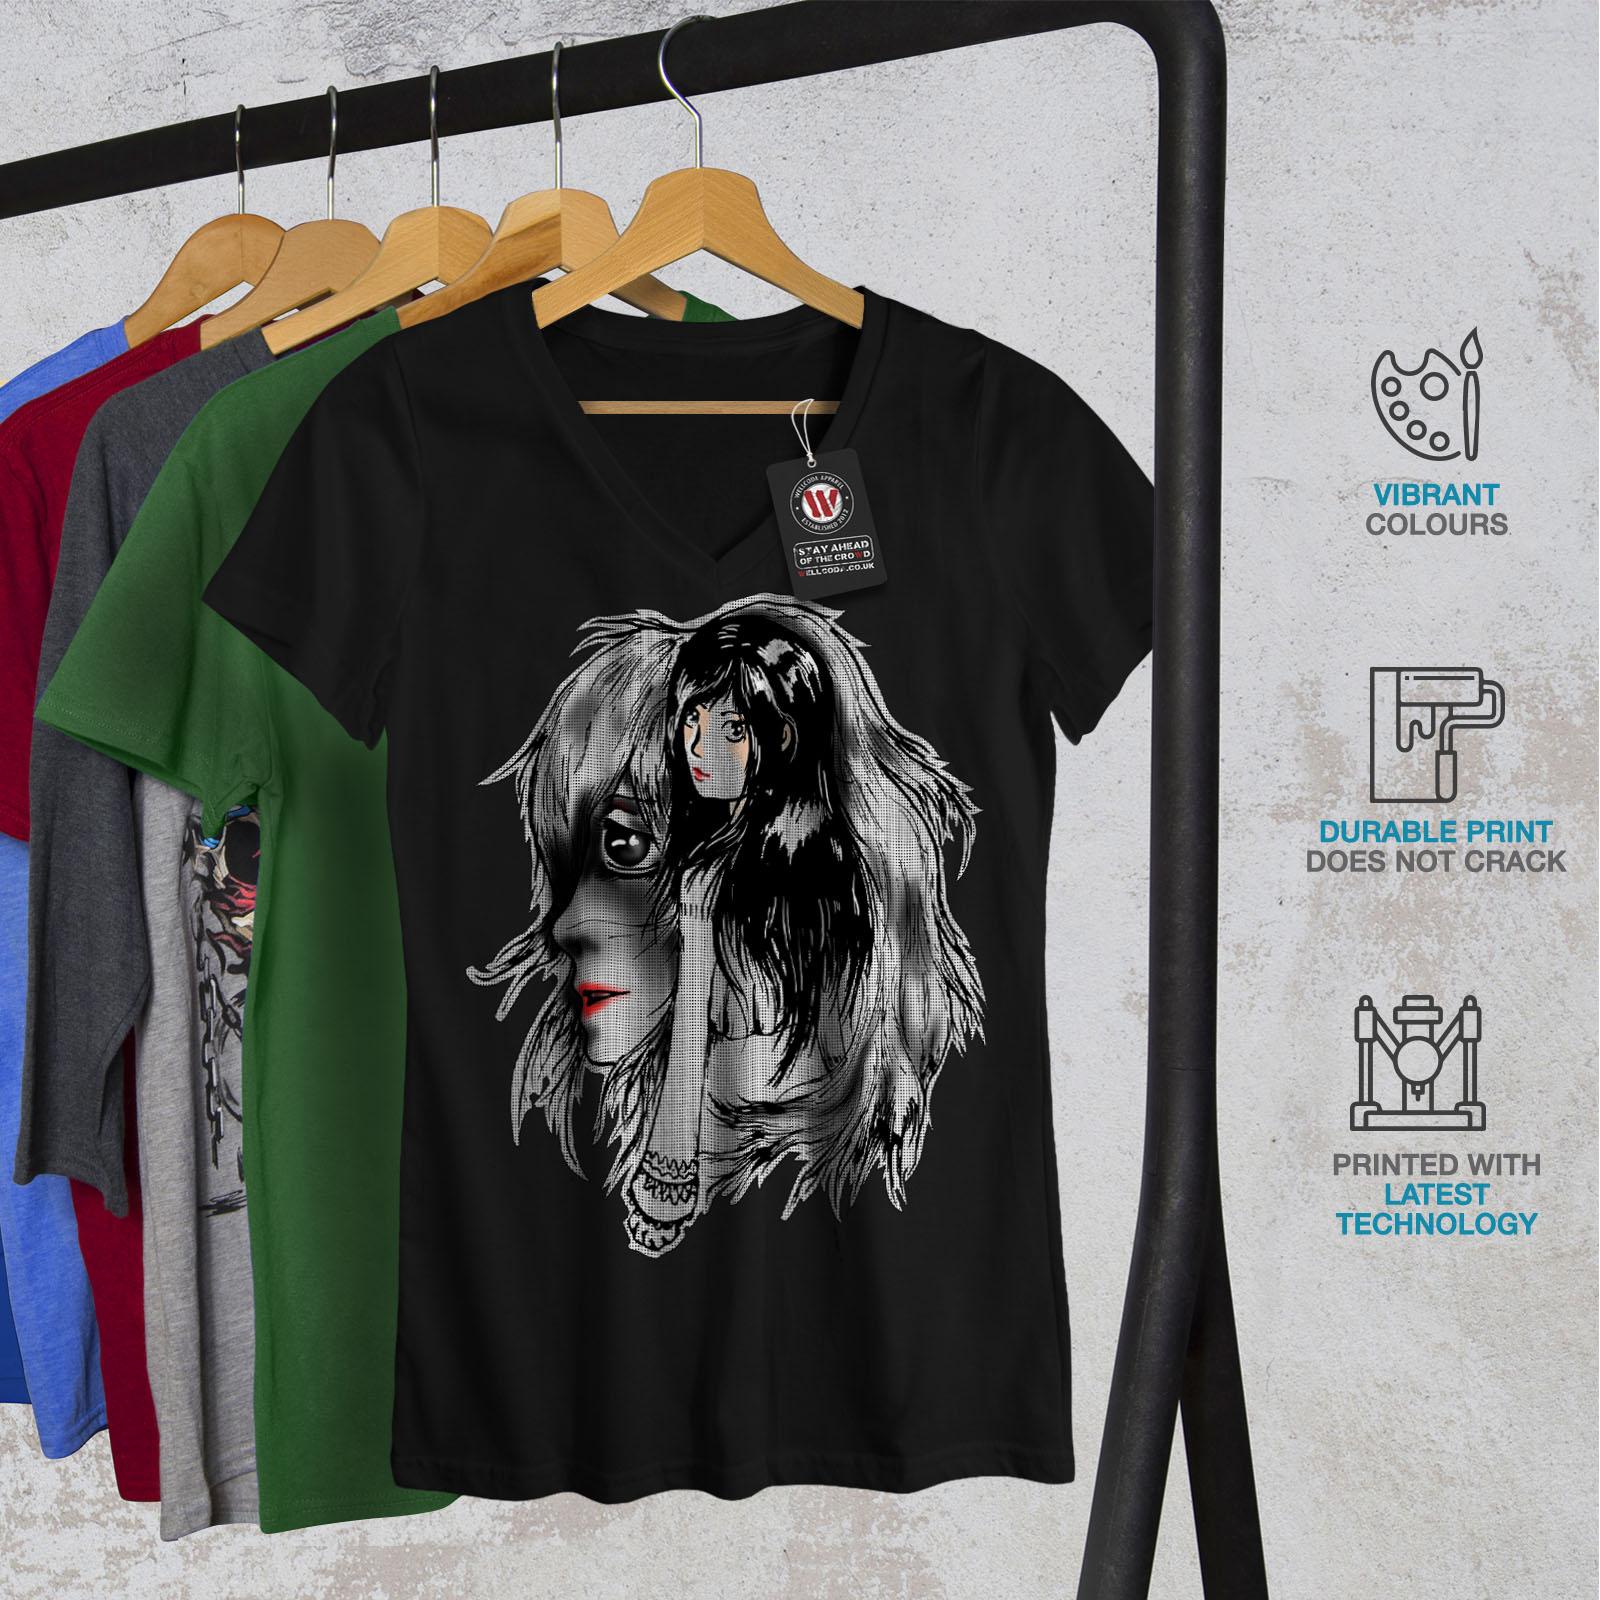 Wellcoda-BELLISSIMO-ANIME-Da-Donna-V-Neck-T-shirt-misterioso-Design-Grafico-Tee miniatura 4